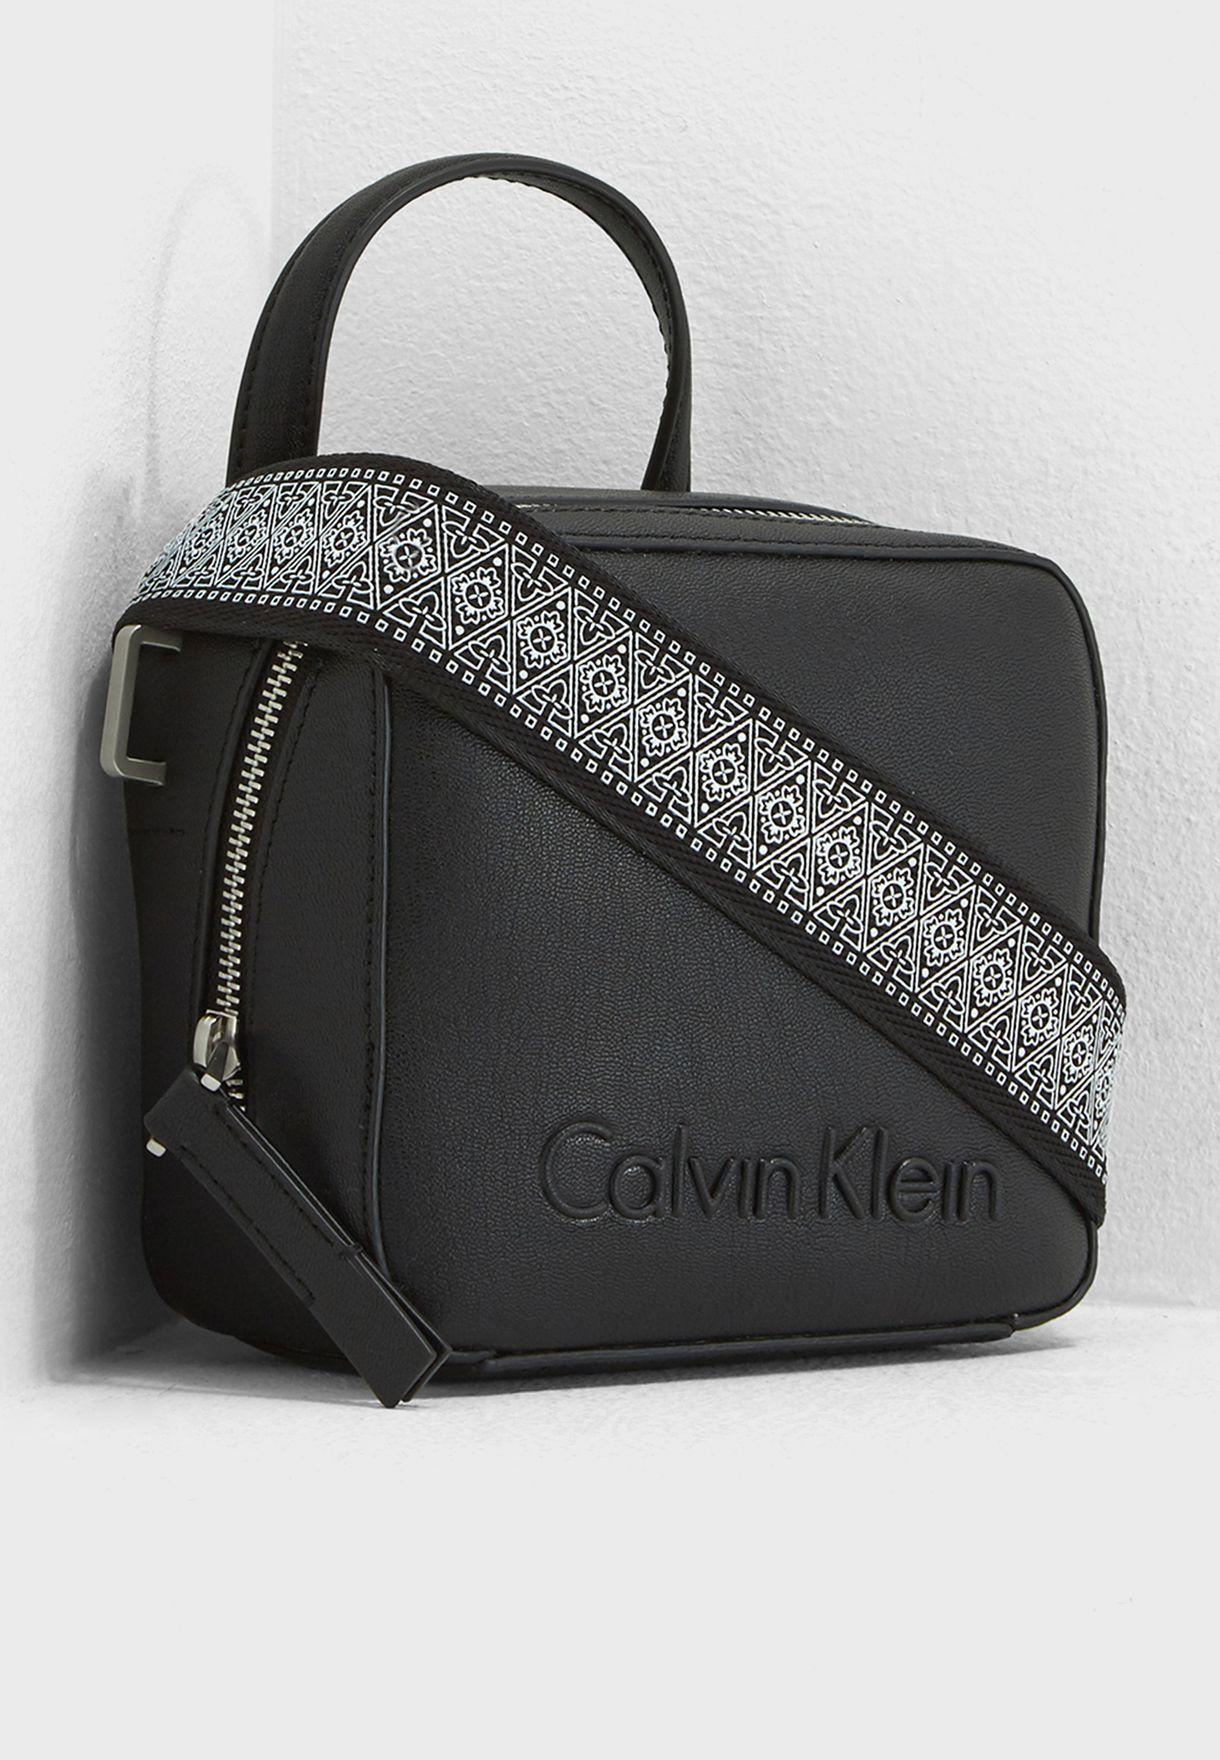 74214b76e7 Shop Calvin Klein black Small Edge Seasonal Crossbody K60K604002 for ...